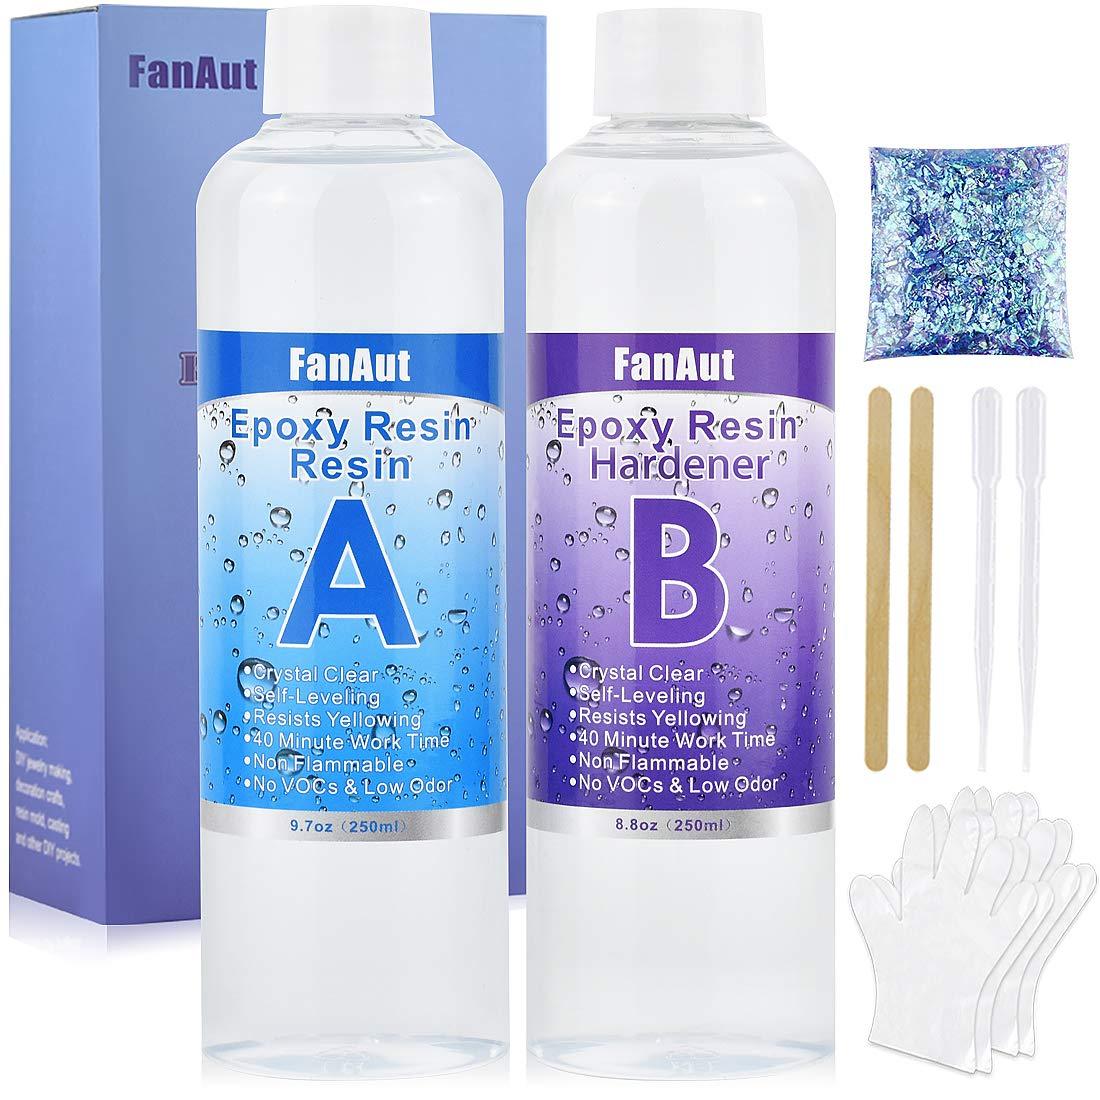 FanAut Epoxy Resin Crystal Clear